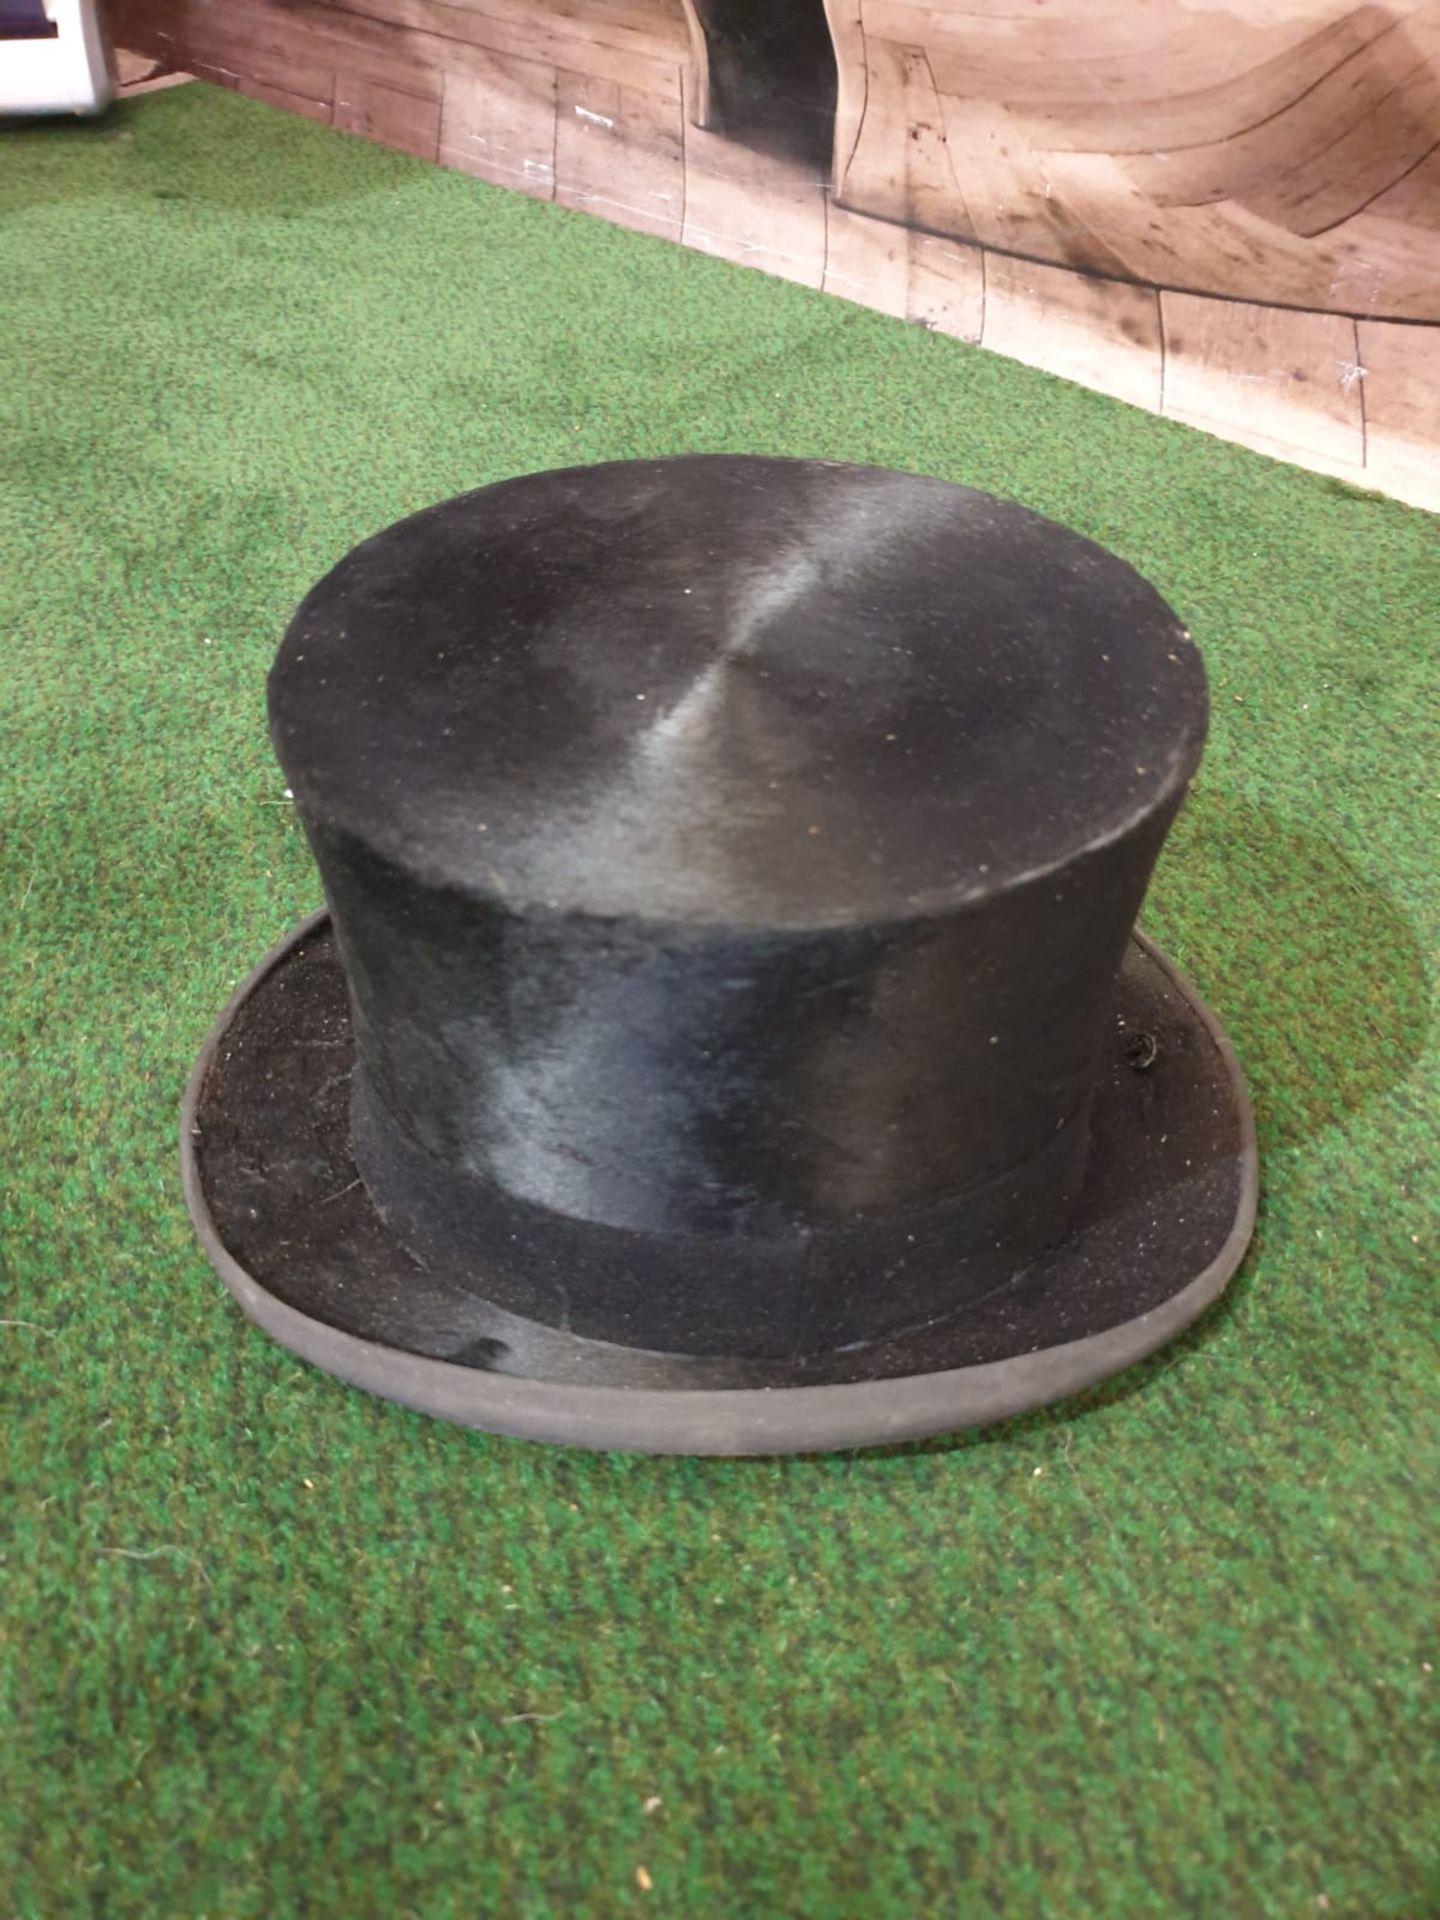 A James Lock + Co. Silk Black Top hat in a Waltar Barnhard card box - Image 2 of 4